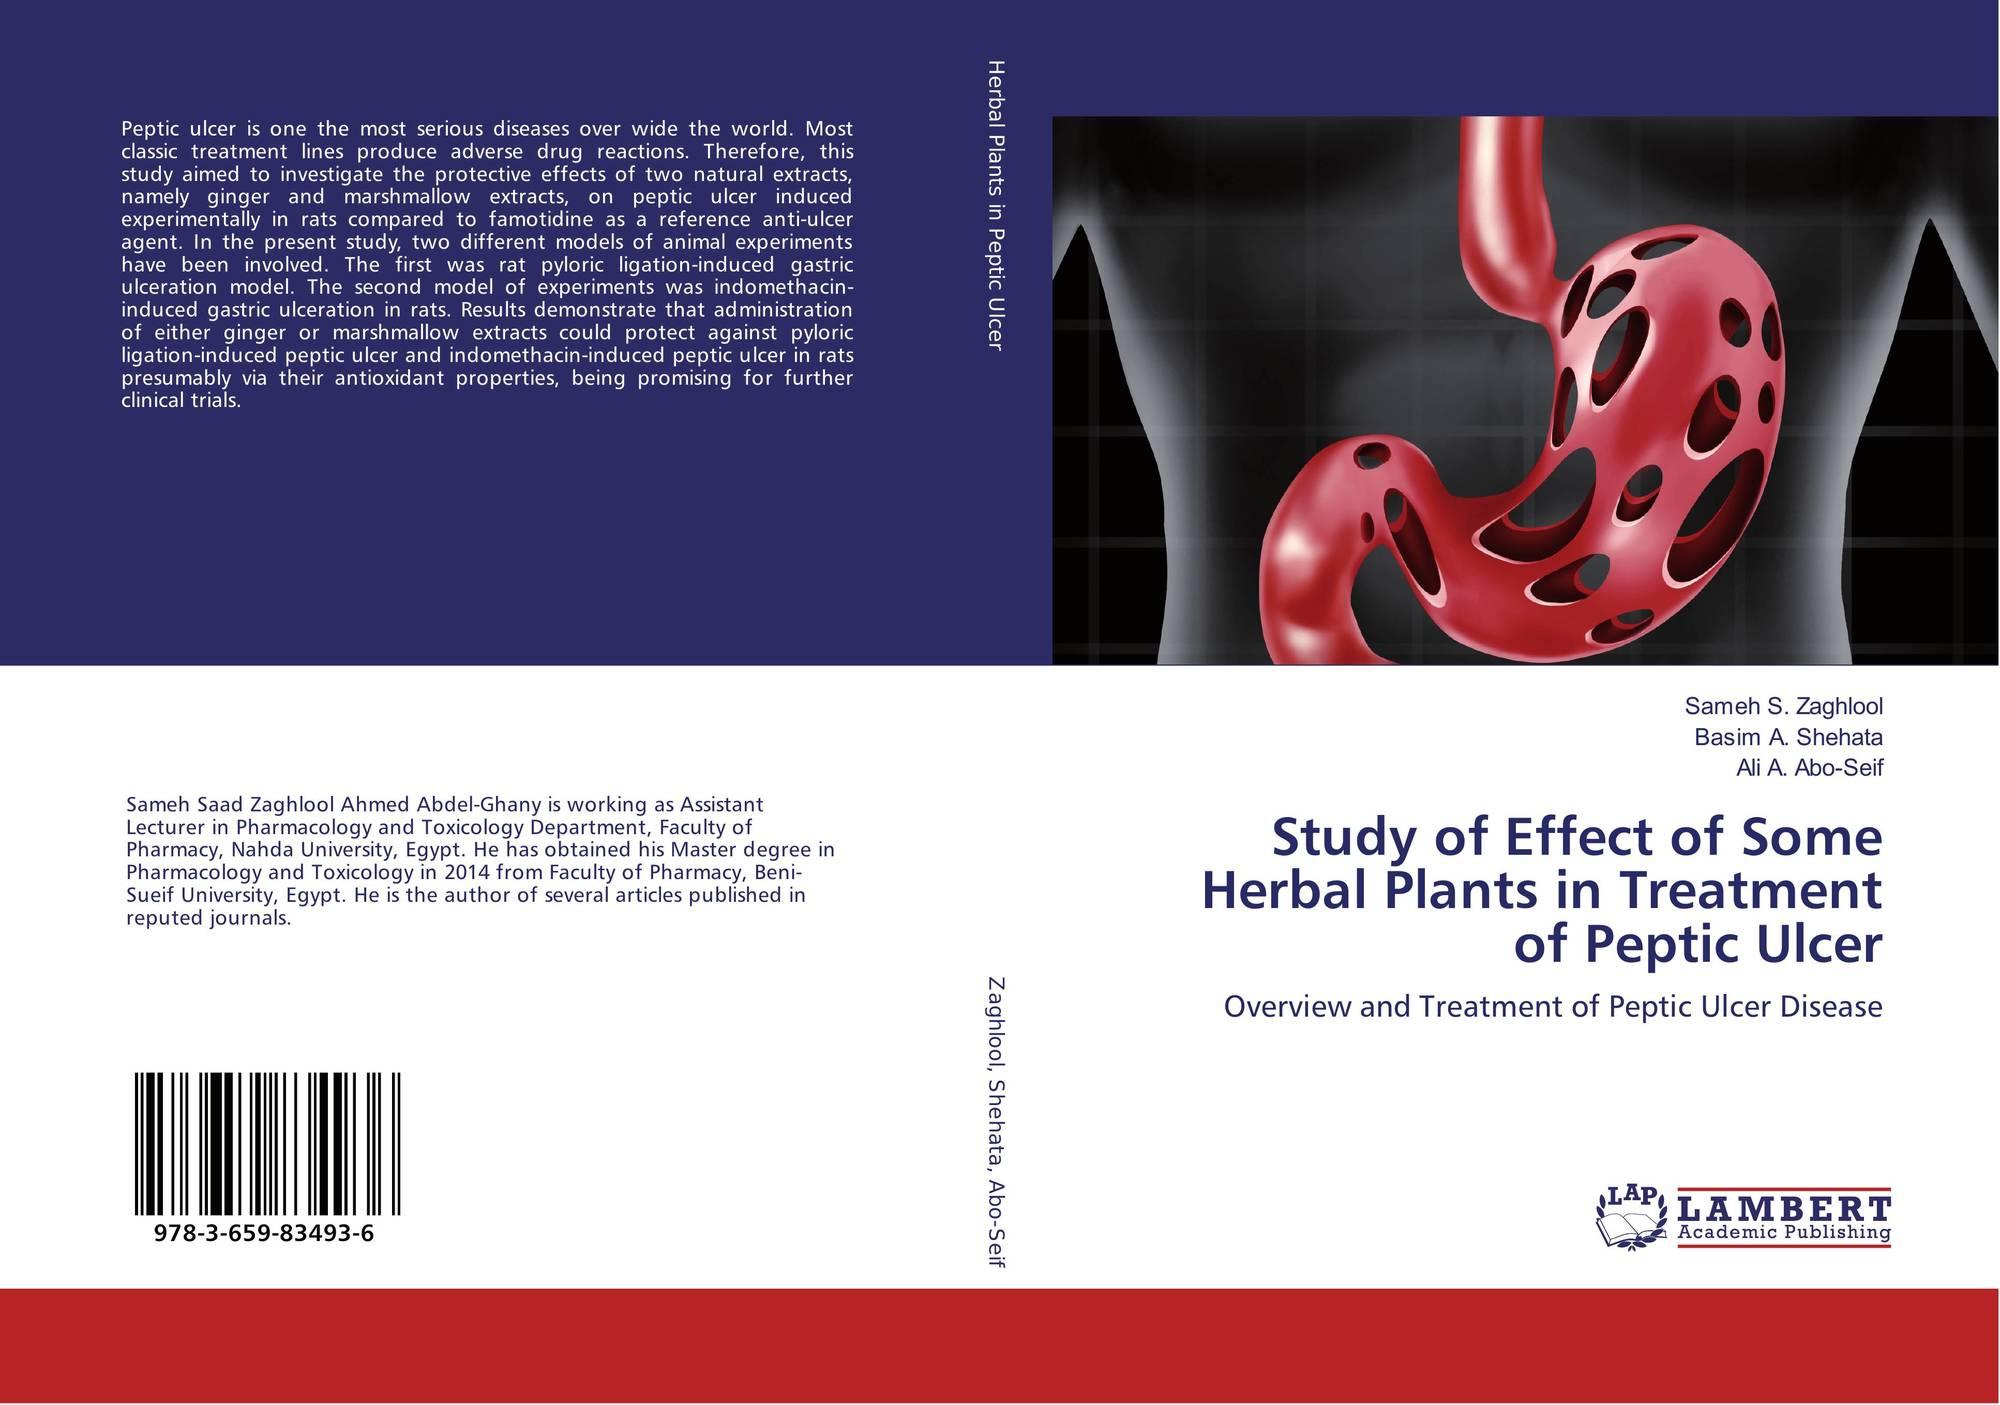 A study of plants